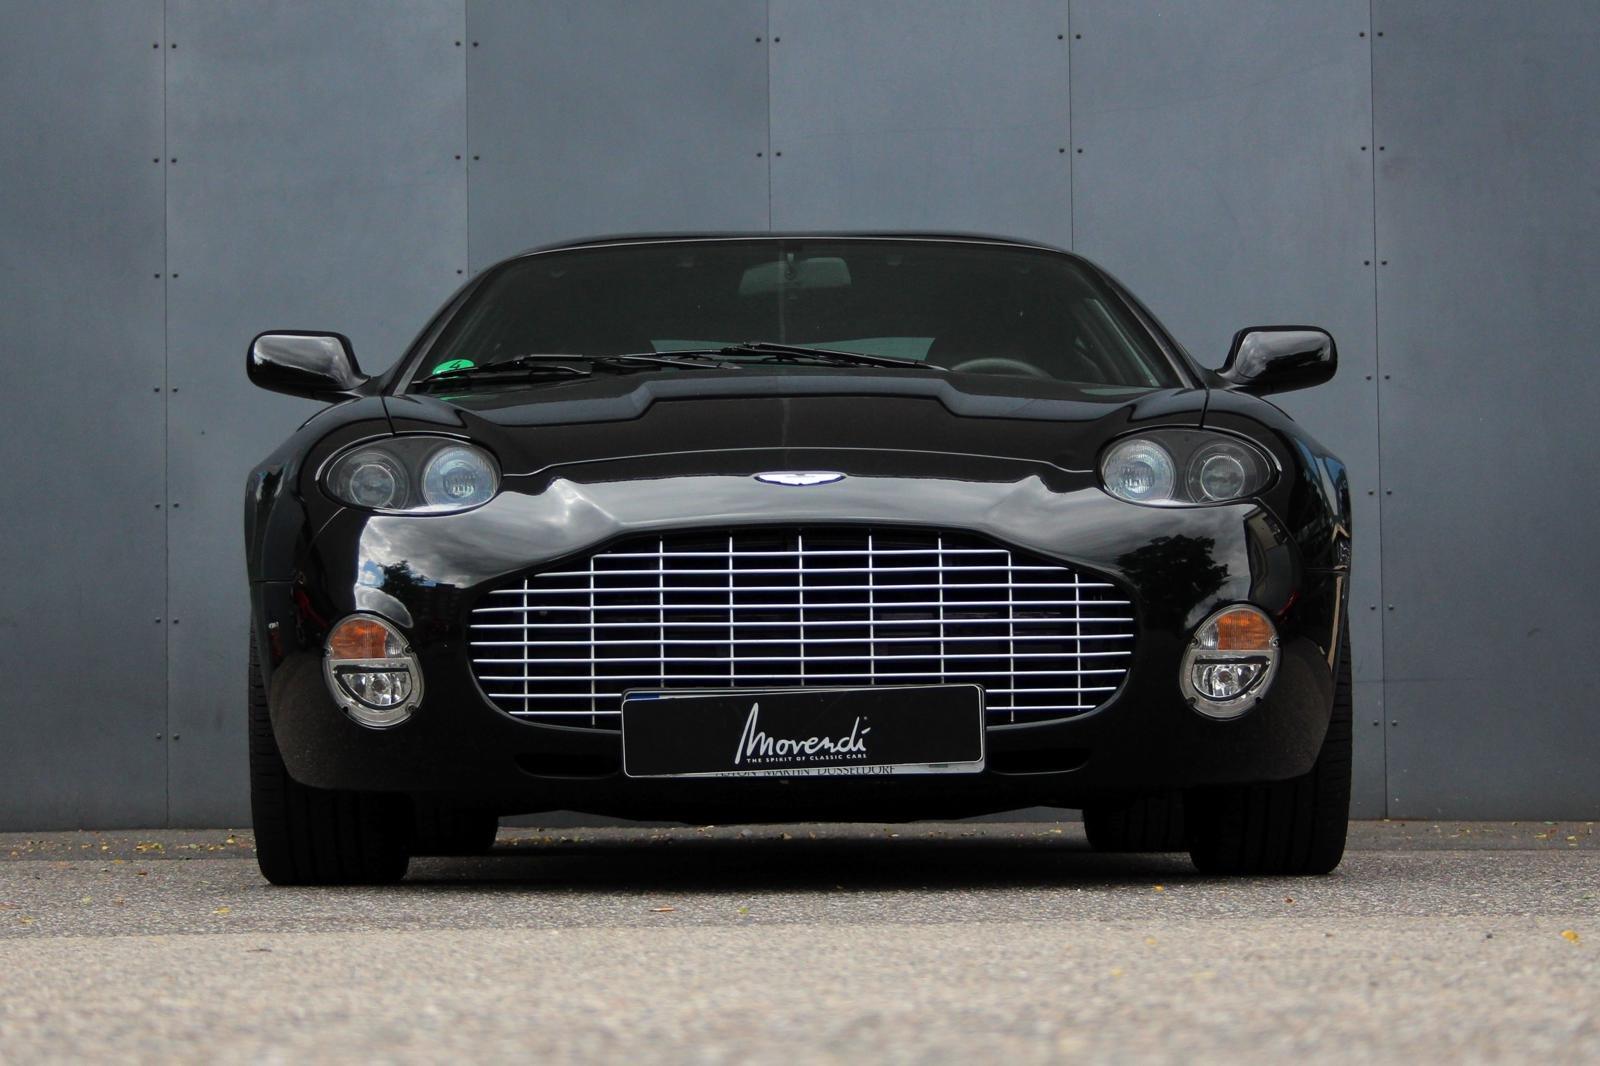 2004 Aston Martin DB 7 GT Zagato LHD  For Sale (picture 5 of 6)